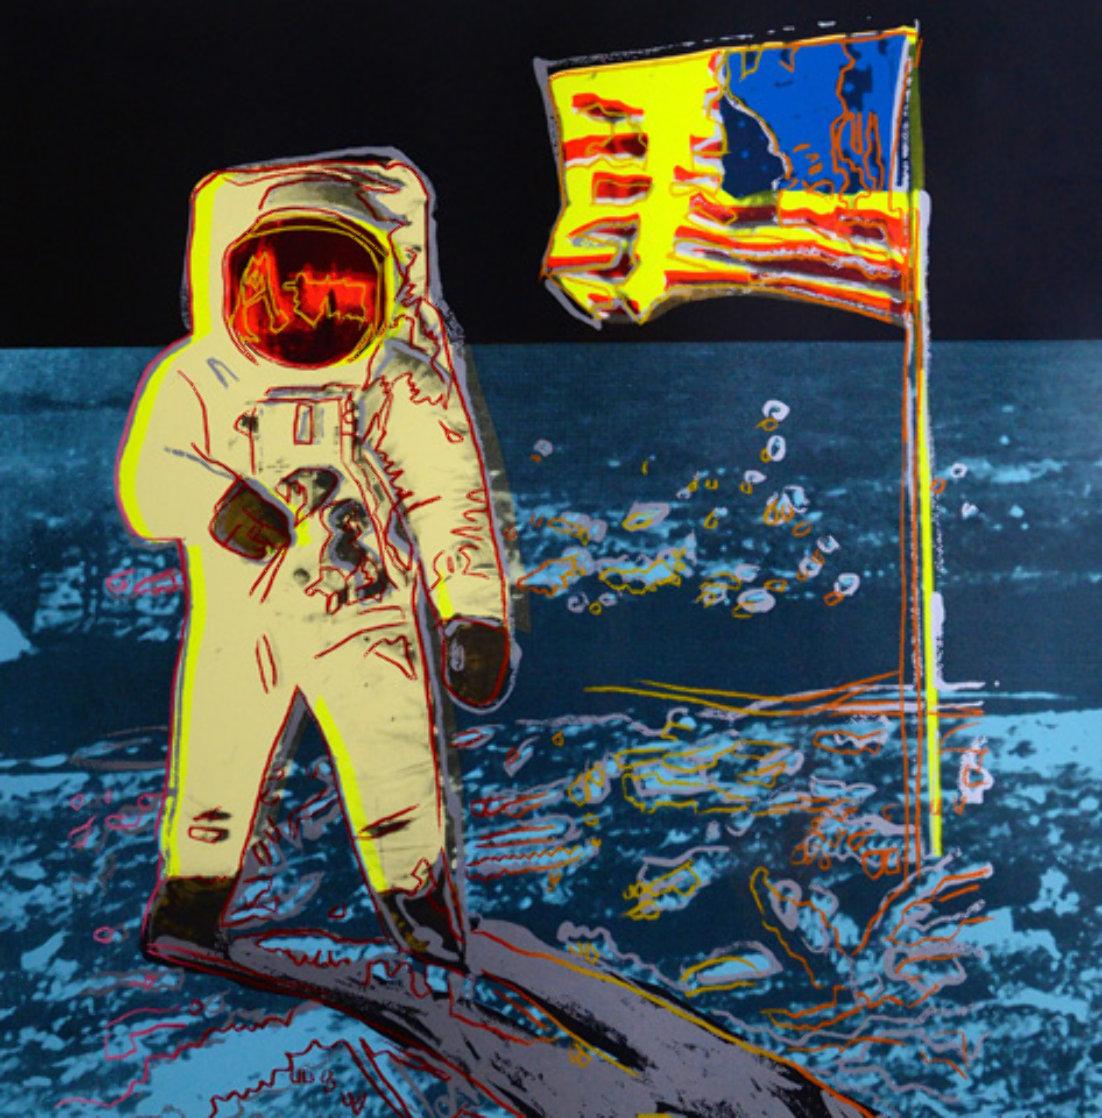 Moonwalk, #404, 1987 Limited Edition Print by Andy Warhol